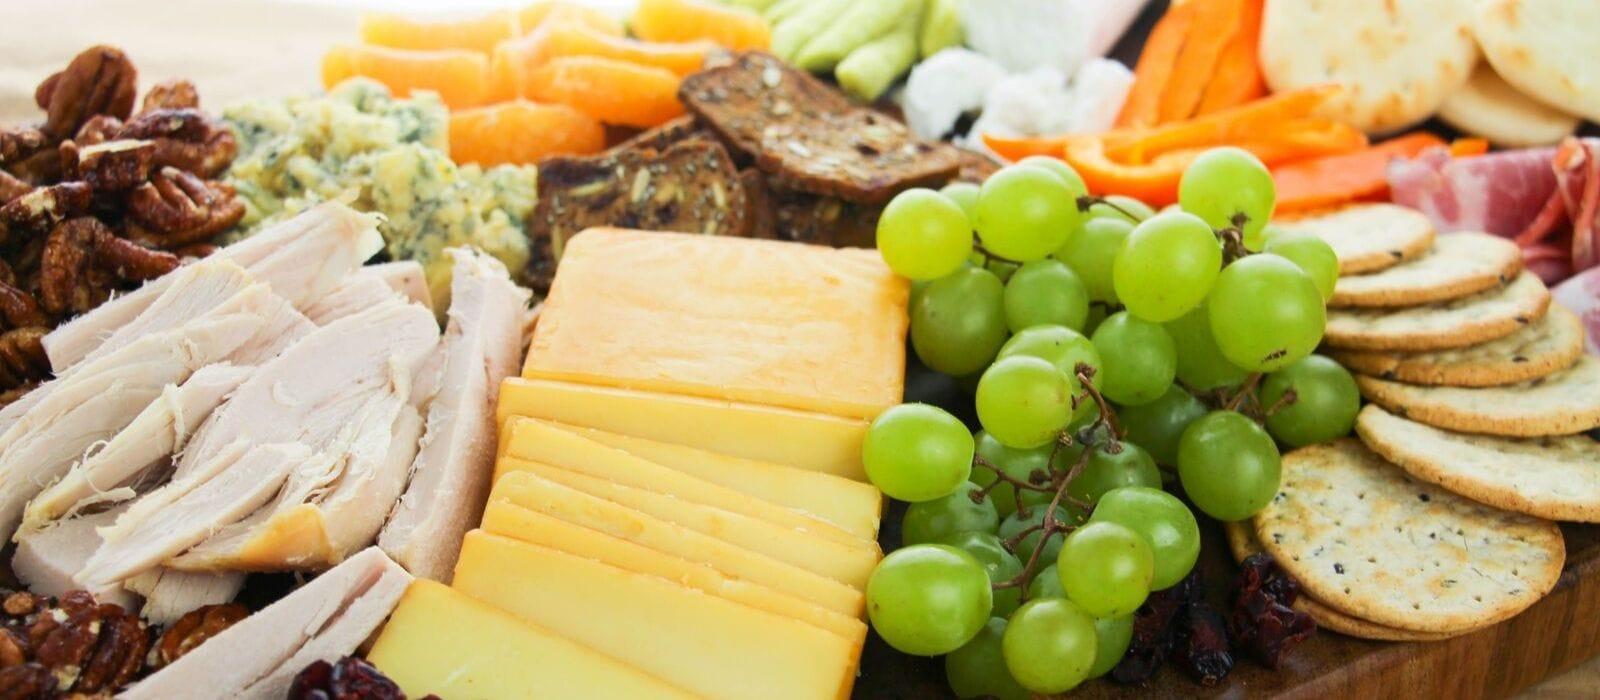 How to Make a Fall Cheeseboard = horizontal close up of green grapes and cheeses